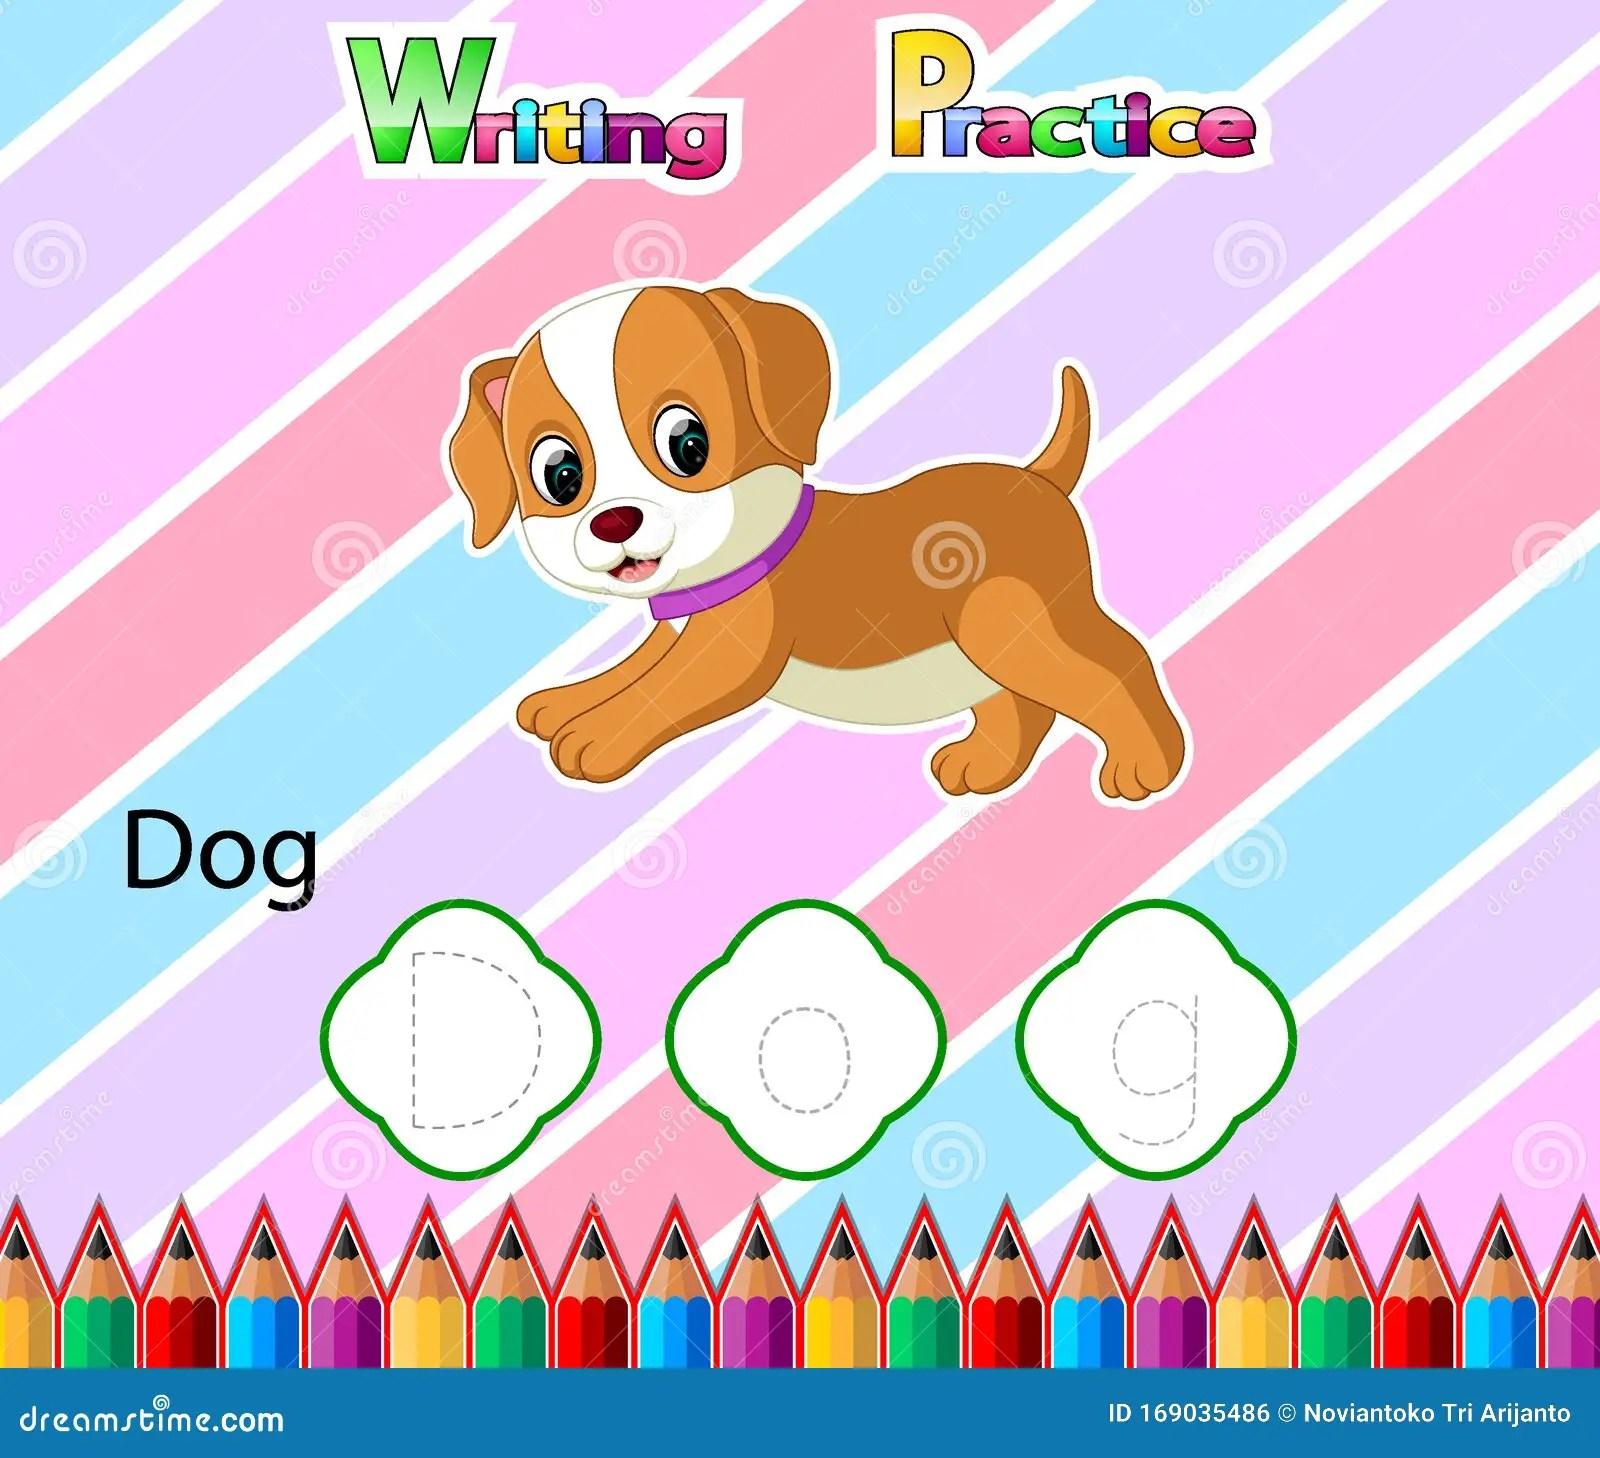 Worksheet Writing Practice Alphabet D For Dog Stock Vector